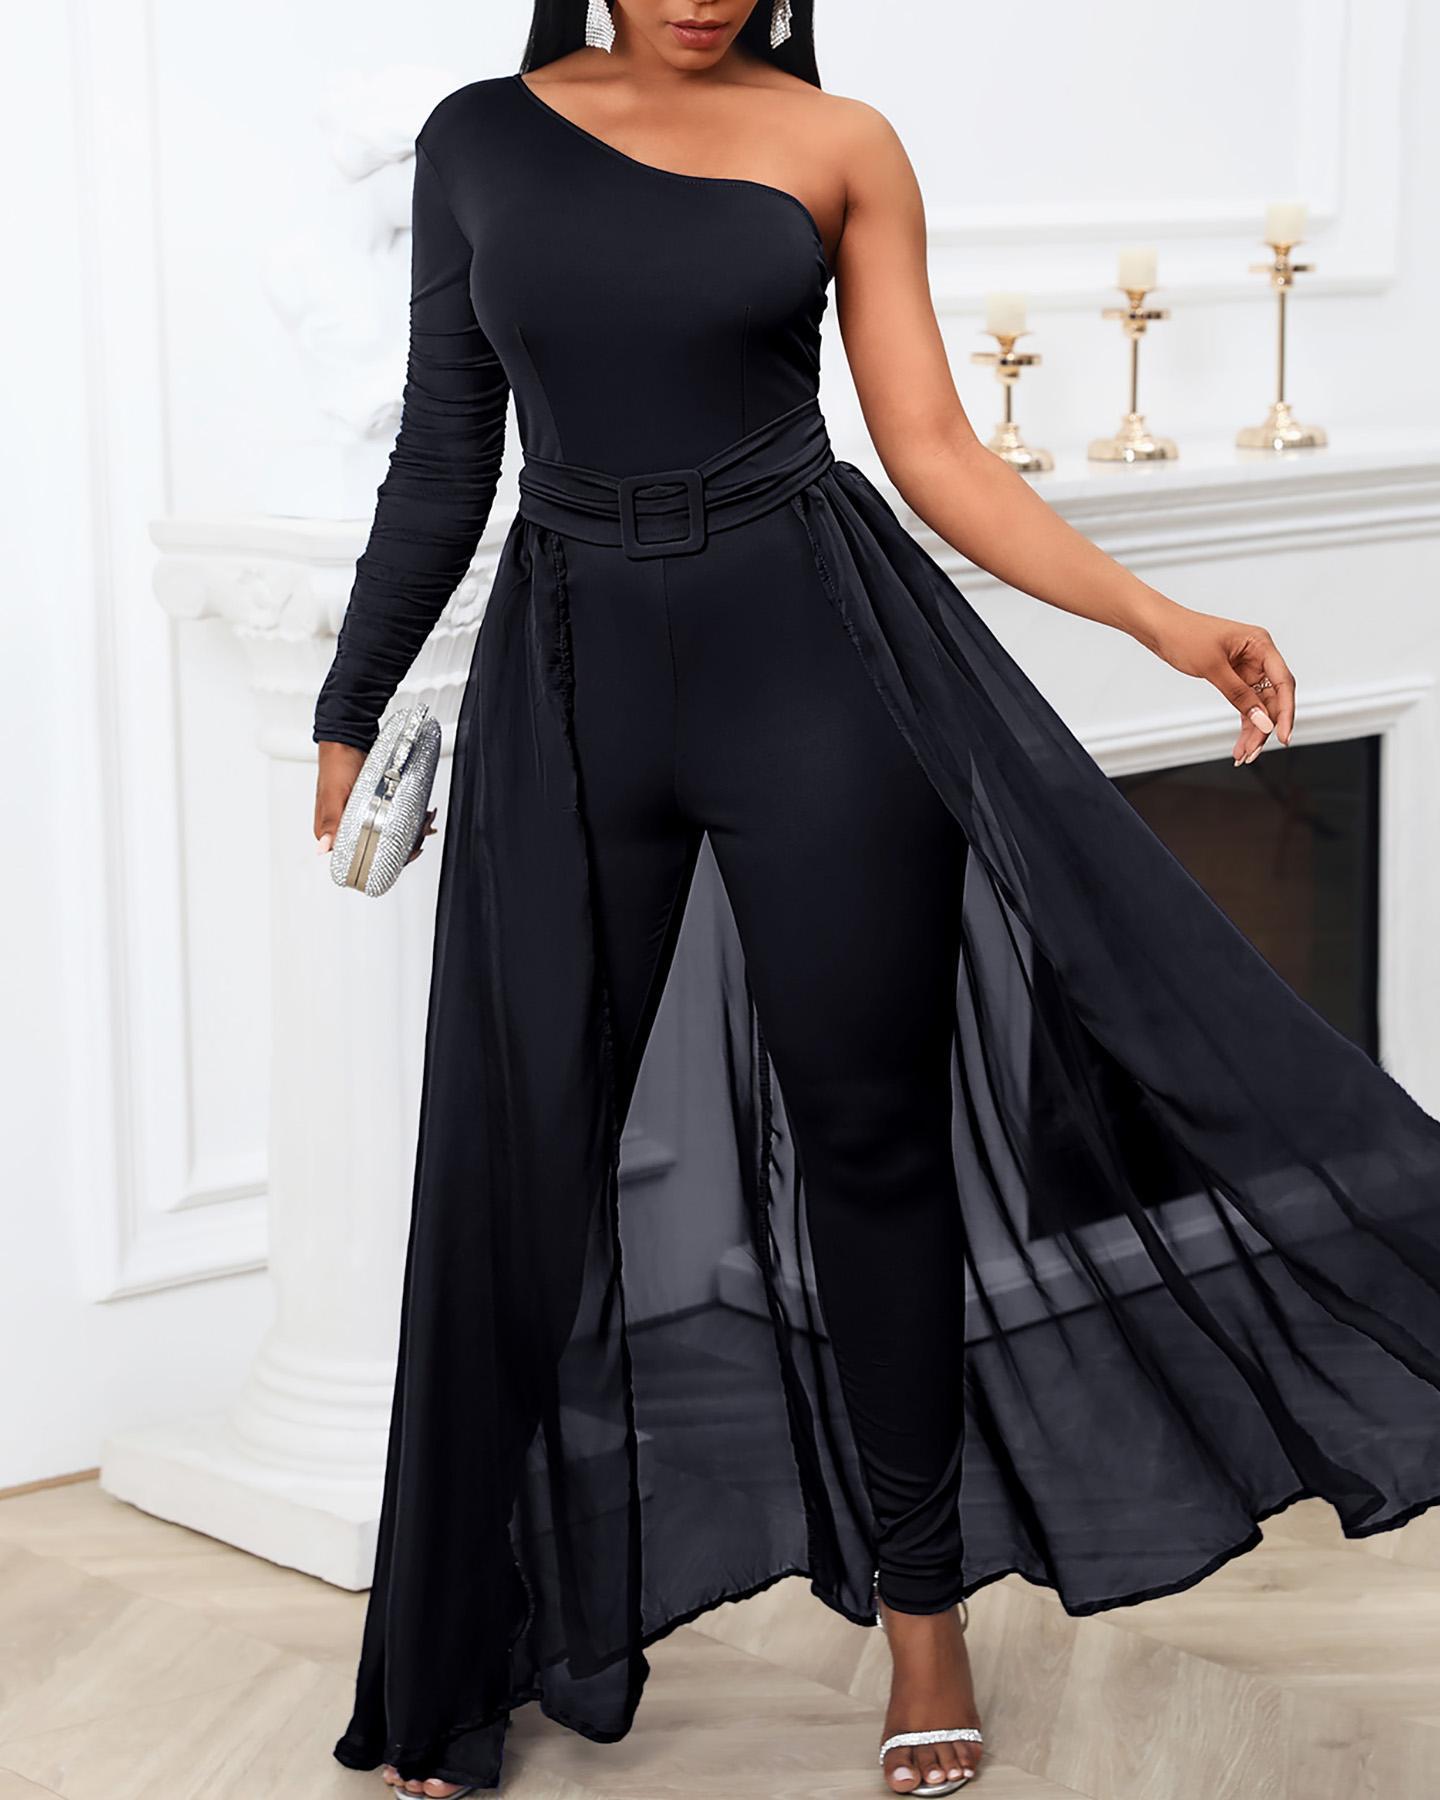 Elegant Casual One Shoulder Plain Sheer Mesh Jumpsuit Long Sleeve Chic Mesh Solid Patchwork